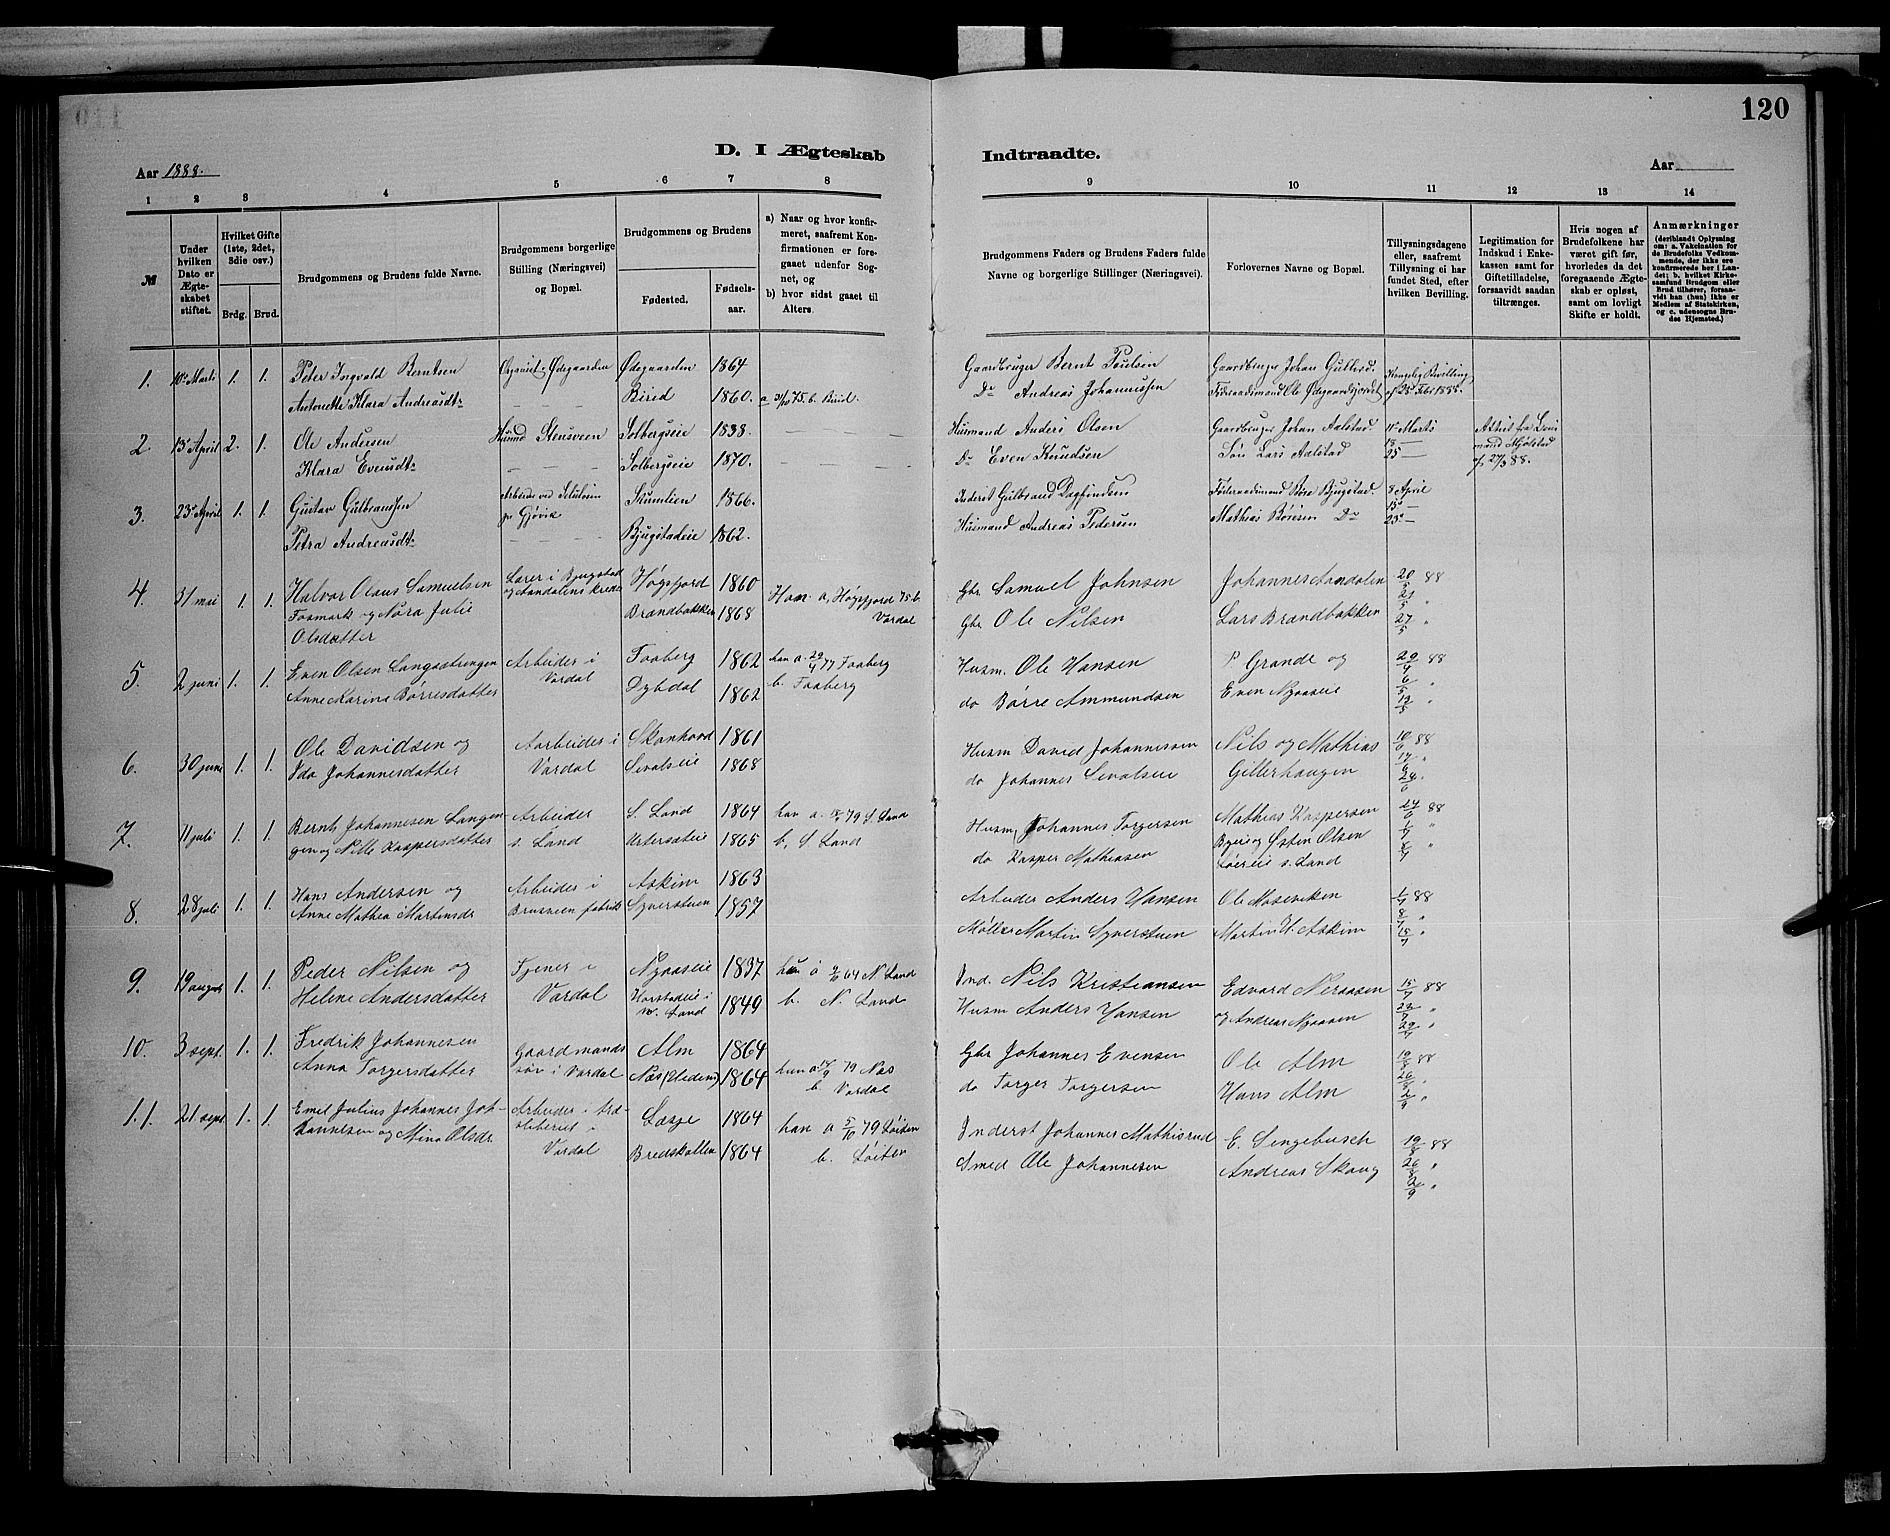 SAH, Vardal prestekontor, H/Ha/Hab/L0008: Klokkerbok nr. 8, 1881-1898, s. 120